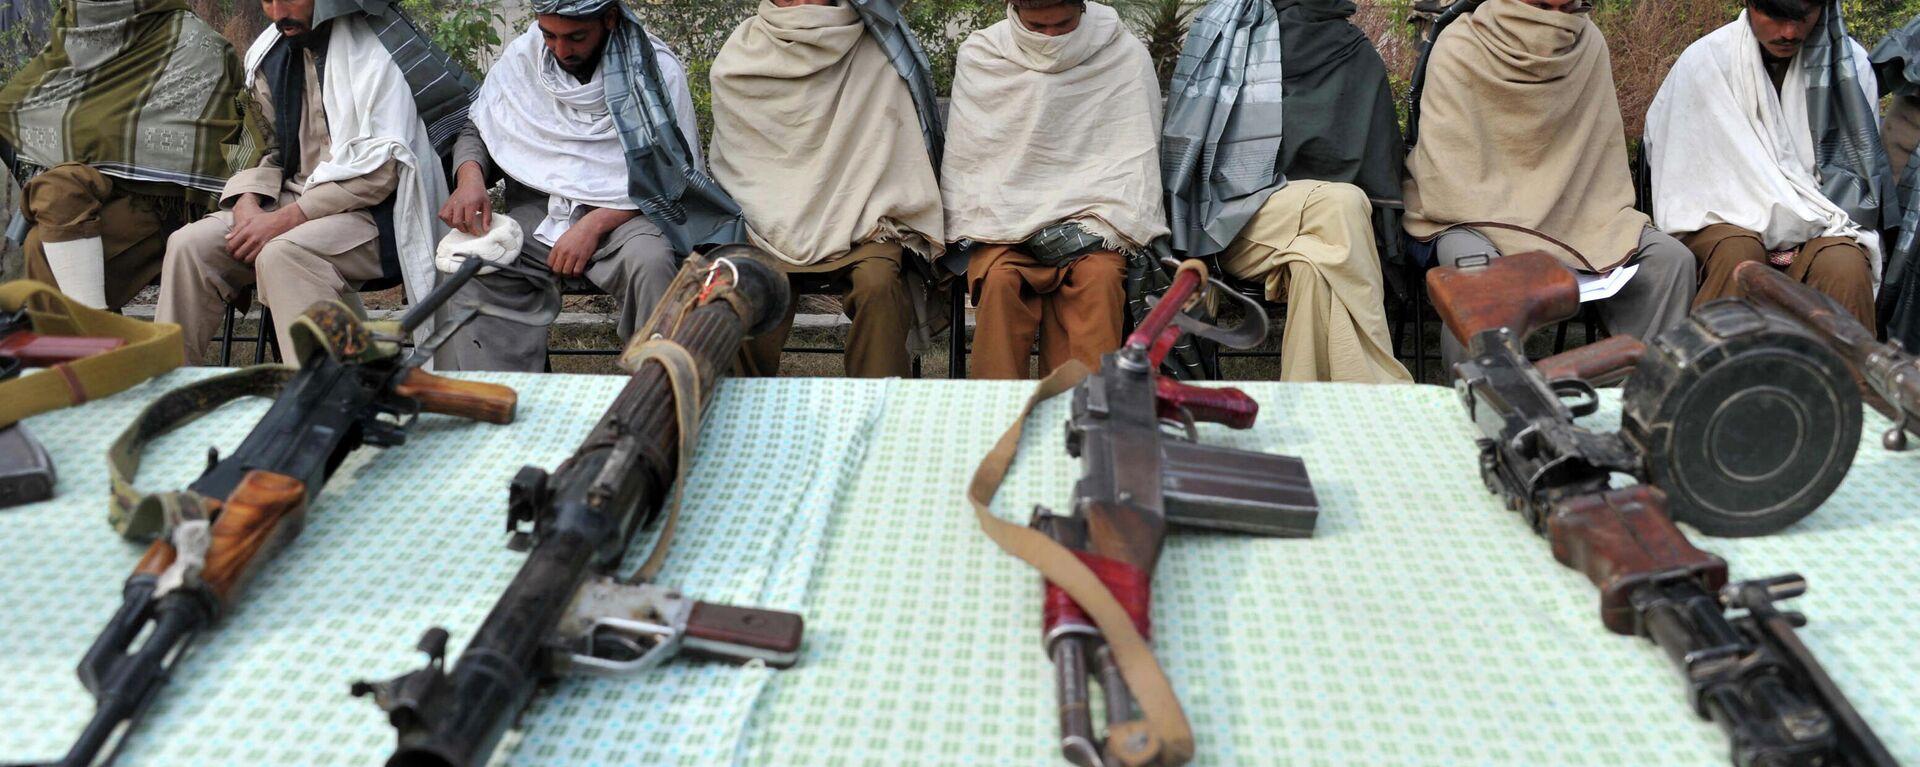 Боевики, запрещенного в РФ, движения Талибан - Sputnik Узбекистан, 1920, 08.07.2021